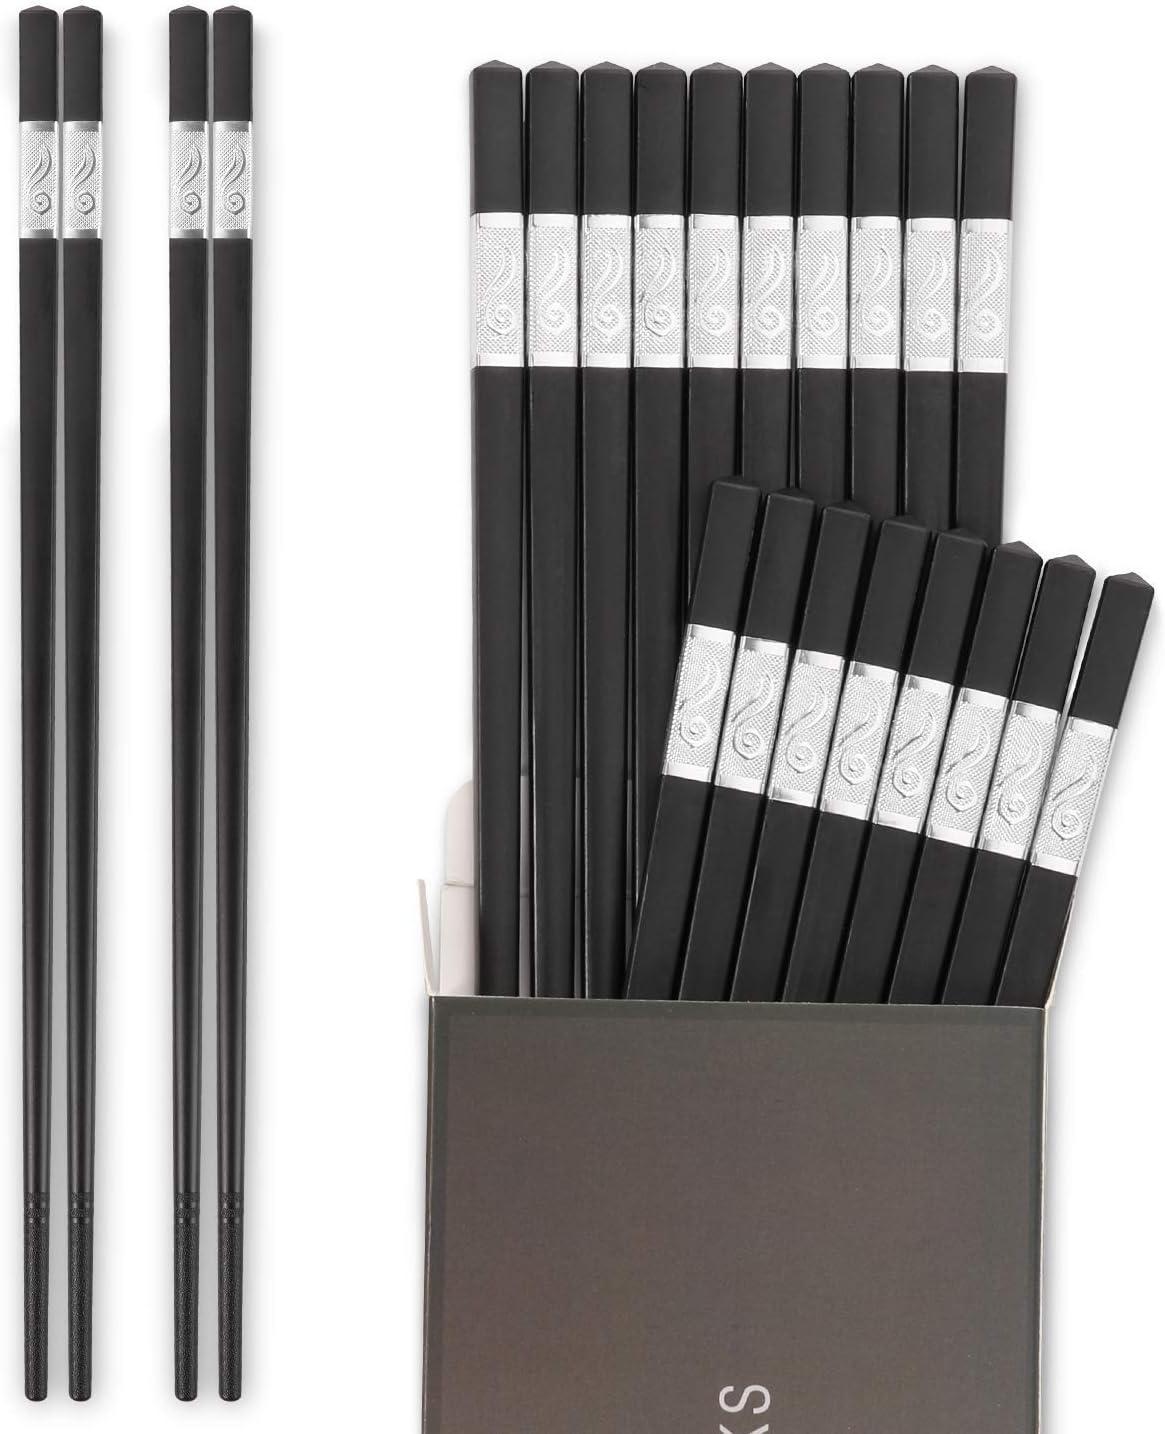 Hiware 10-Pairs Reusable Fiberglass Chopsticks Dishwasher Safe, 9 1/2 Inches - Silver